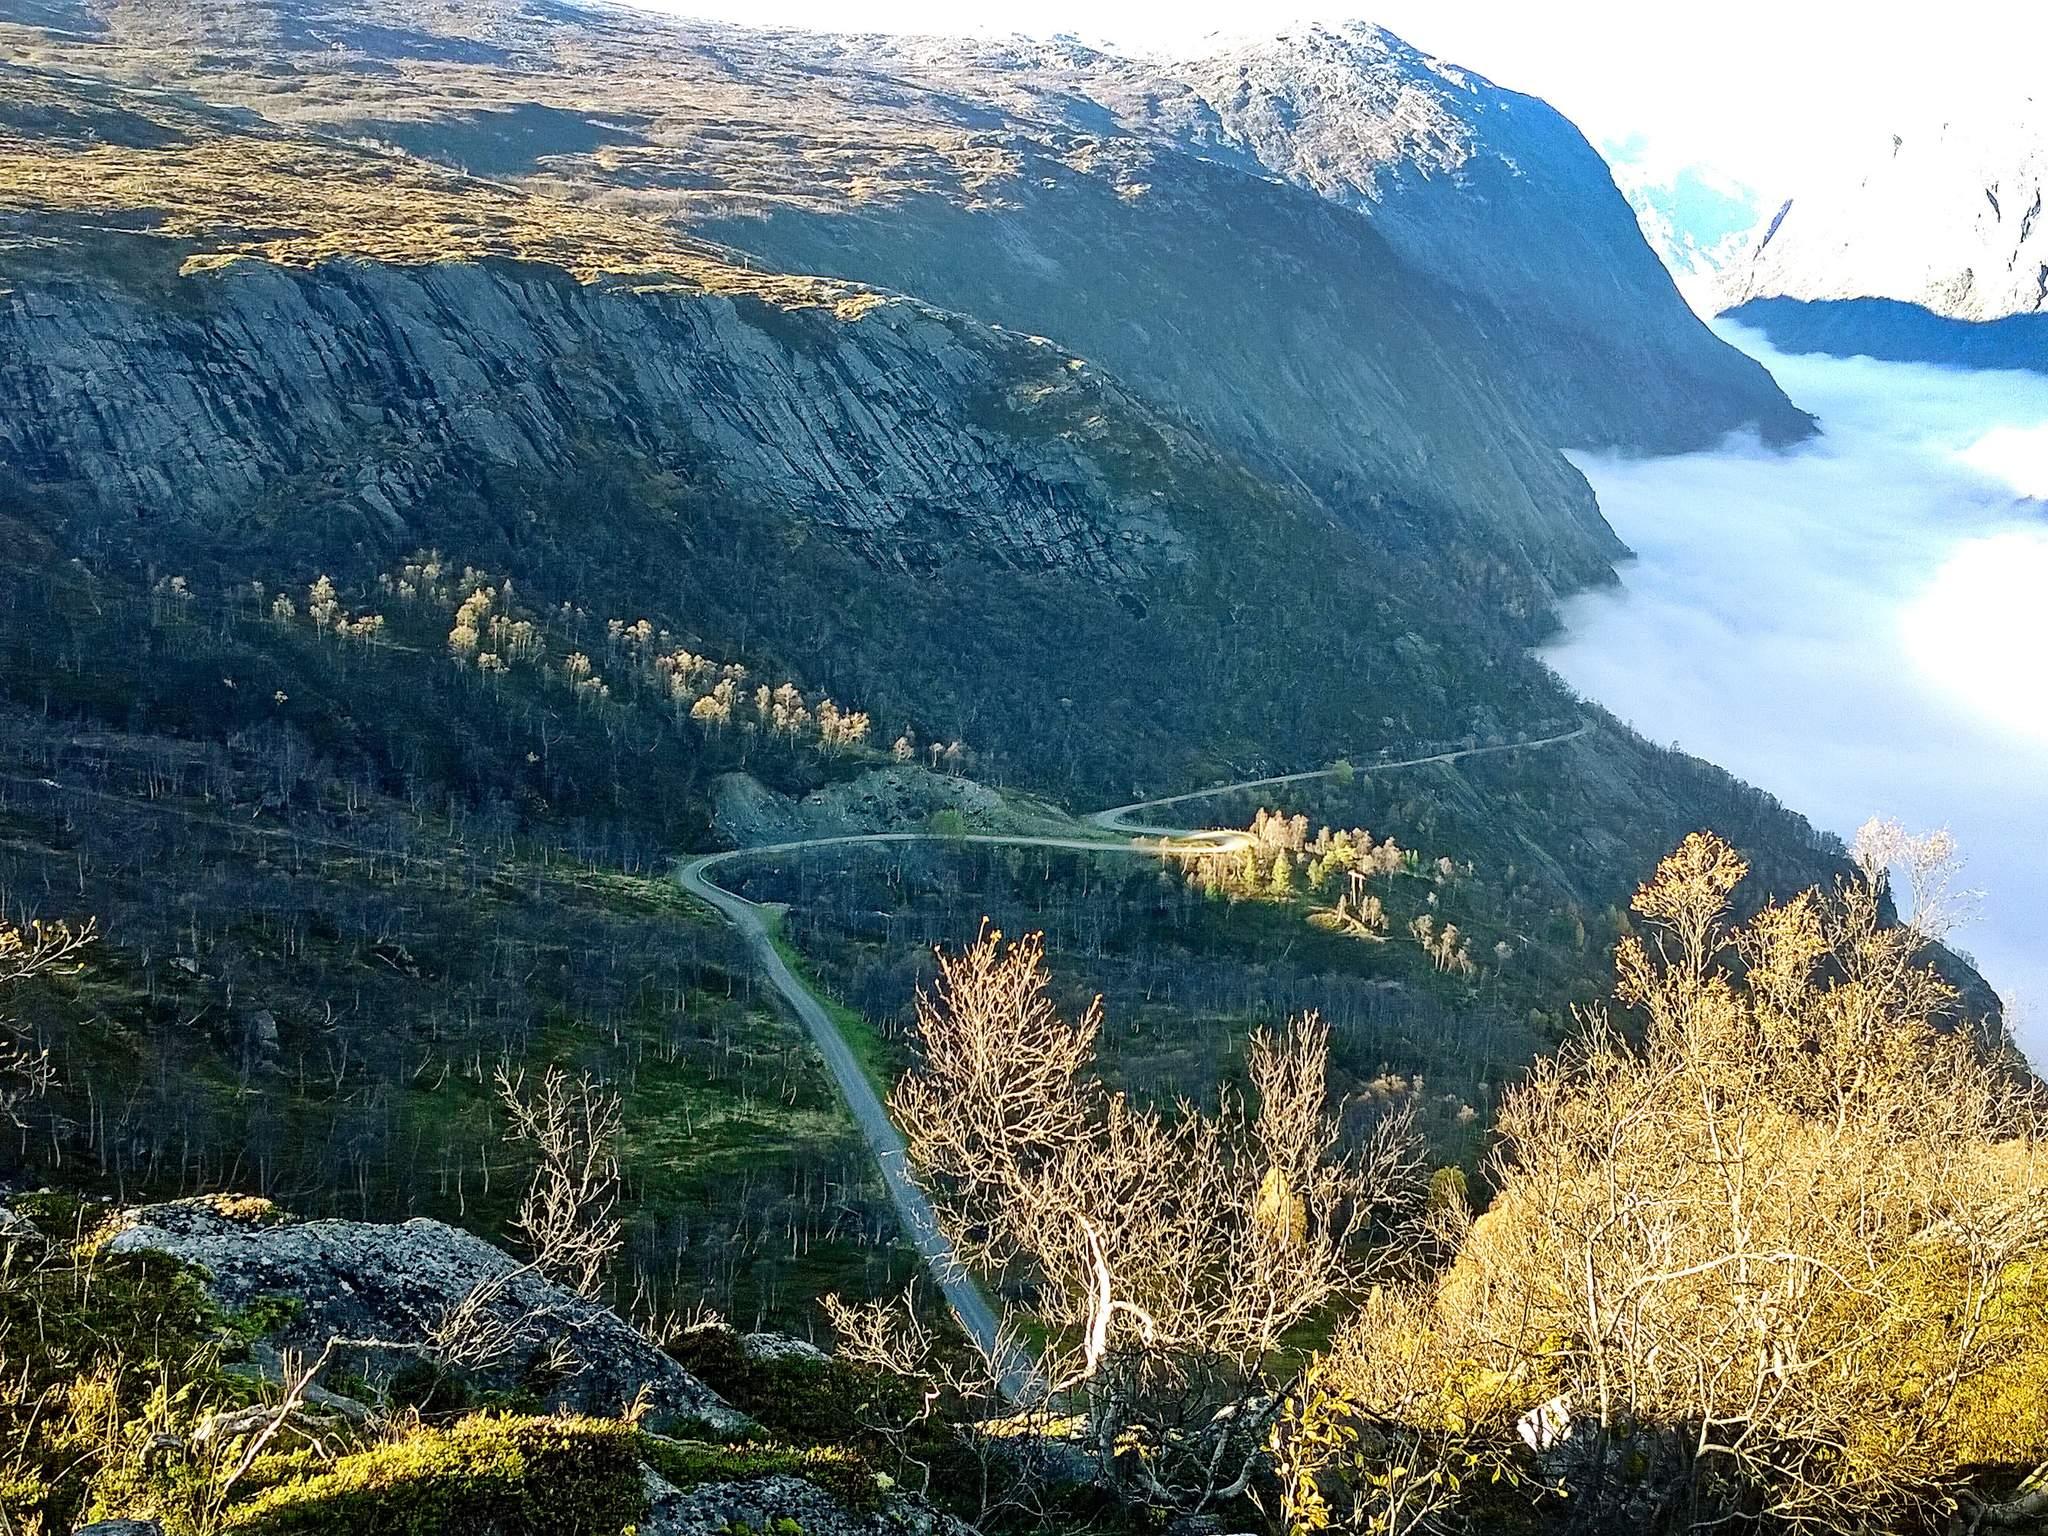 Ferienhaus Eidsvåg (84695), Eidsvåg, More - Romsdal, Westnorwegen, Norwegen, Bild 15